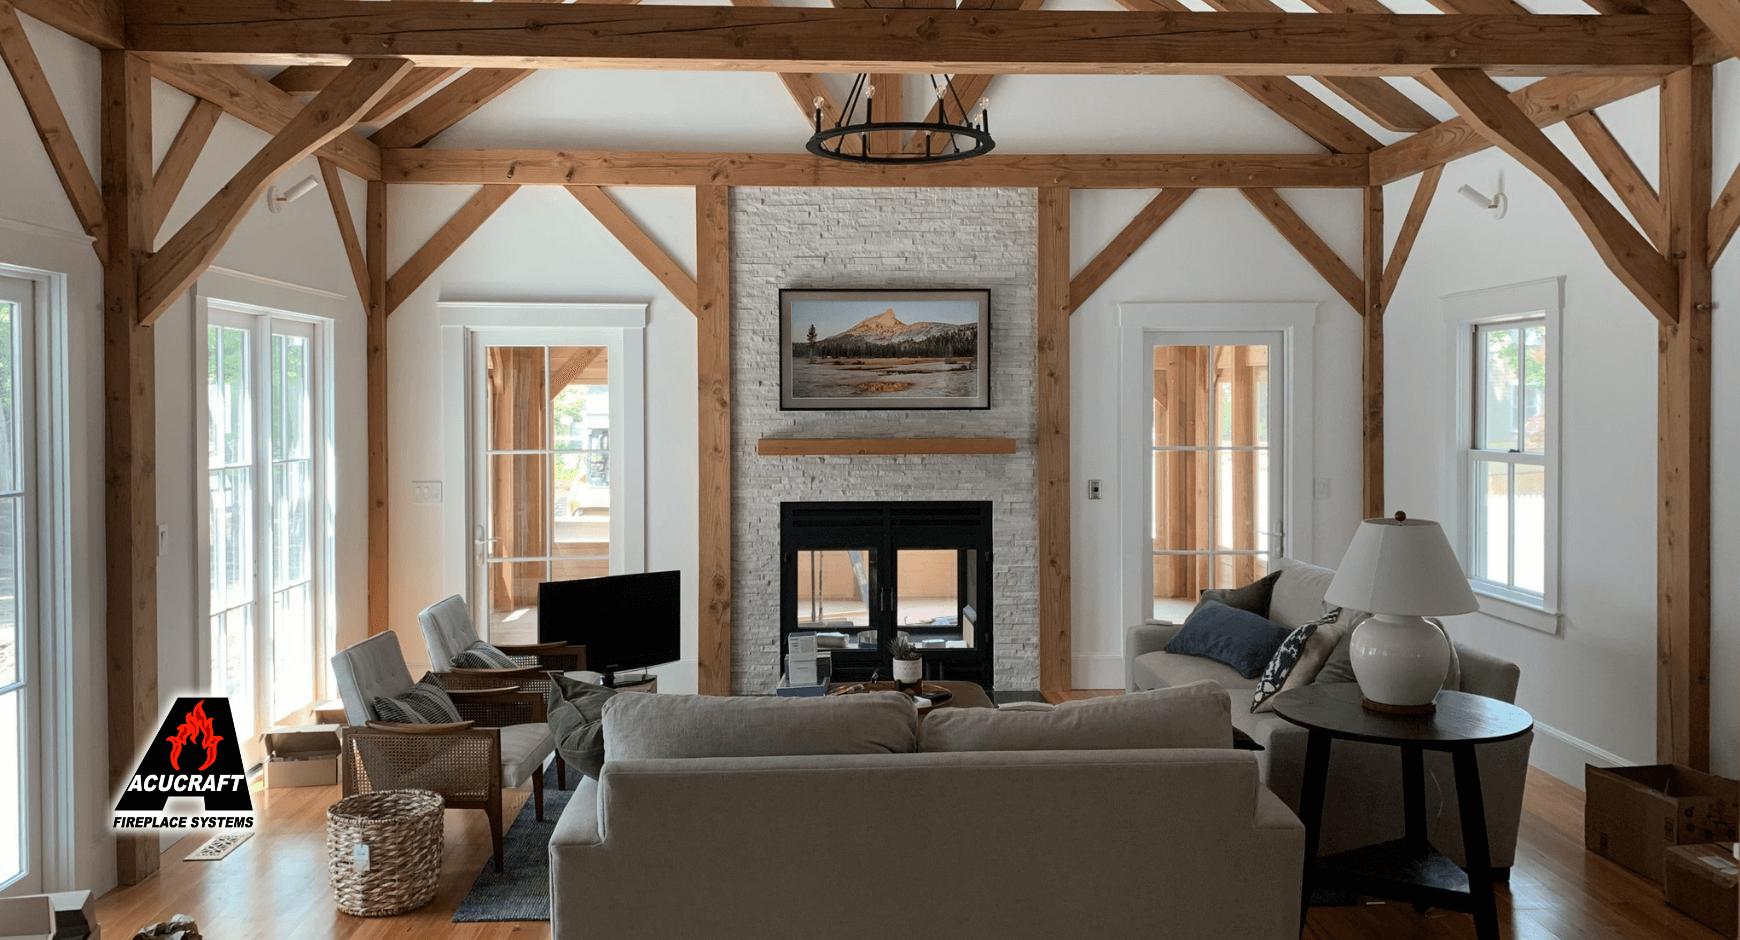 A home fireplace made of thin stone veneer